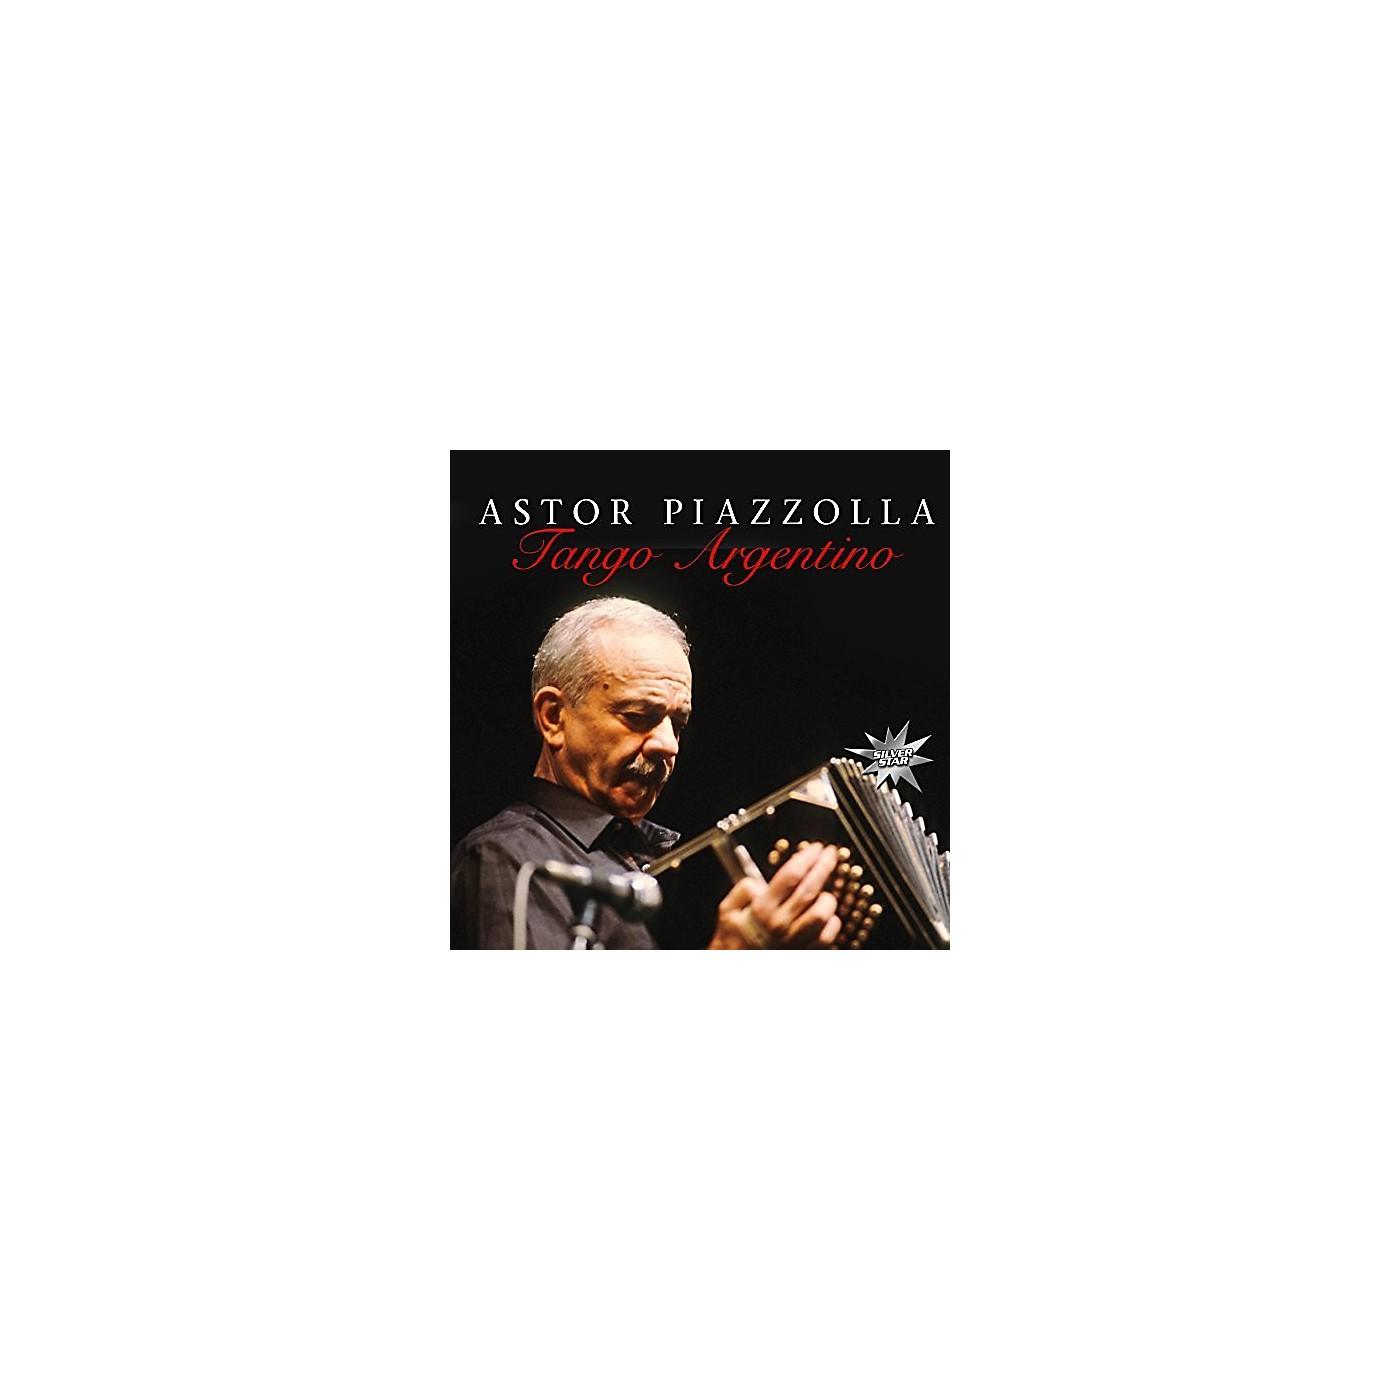 Alliance Astor Piazzolla - Tango Argentino thumbnail